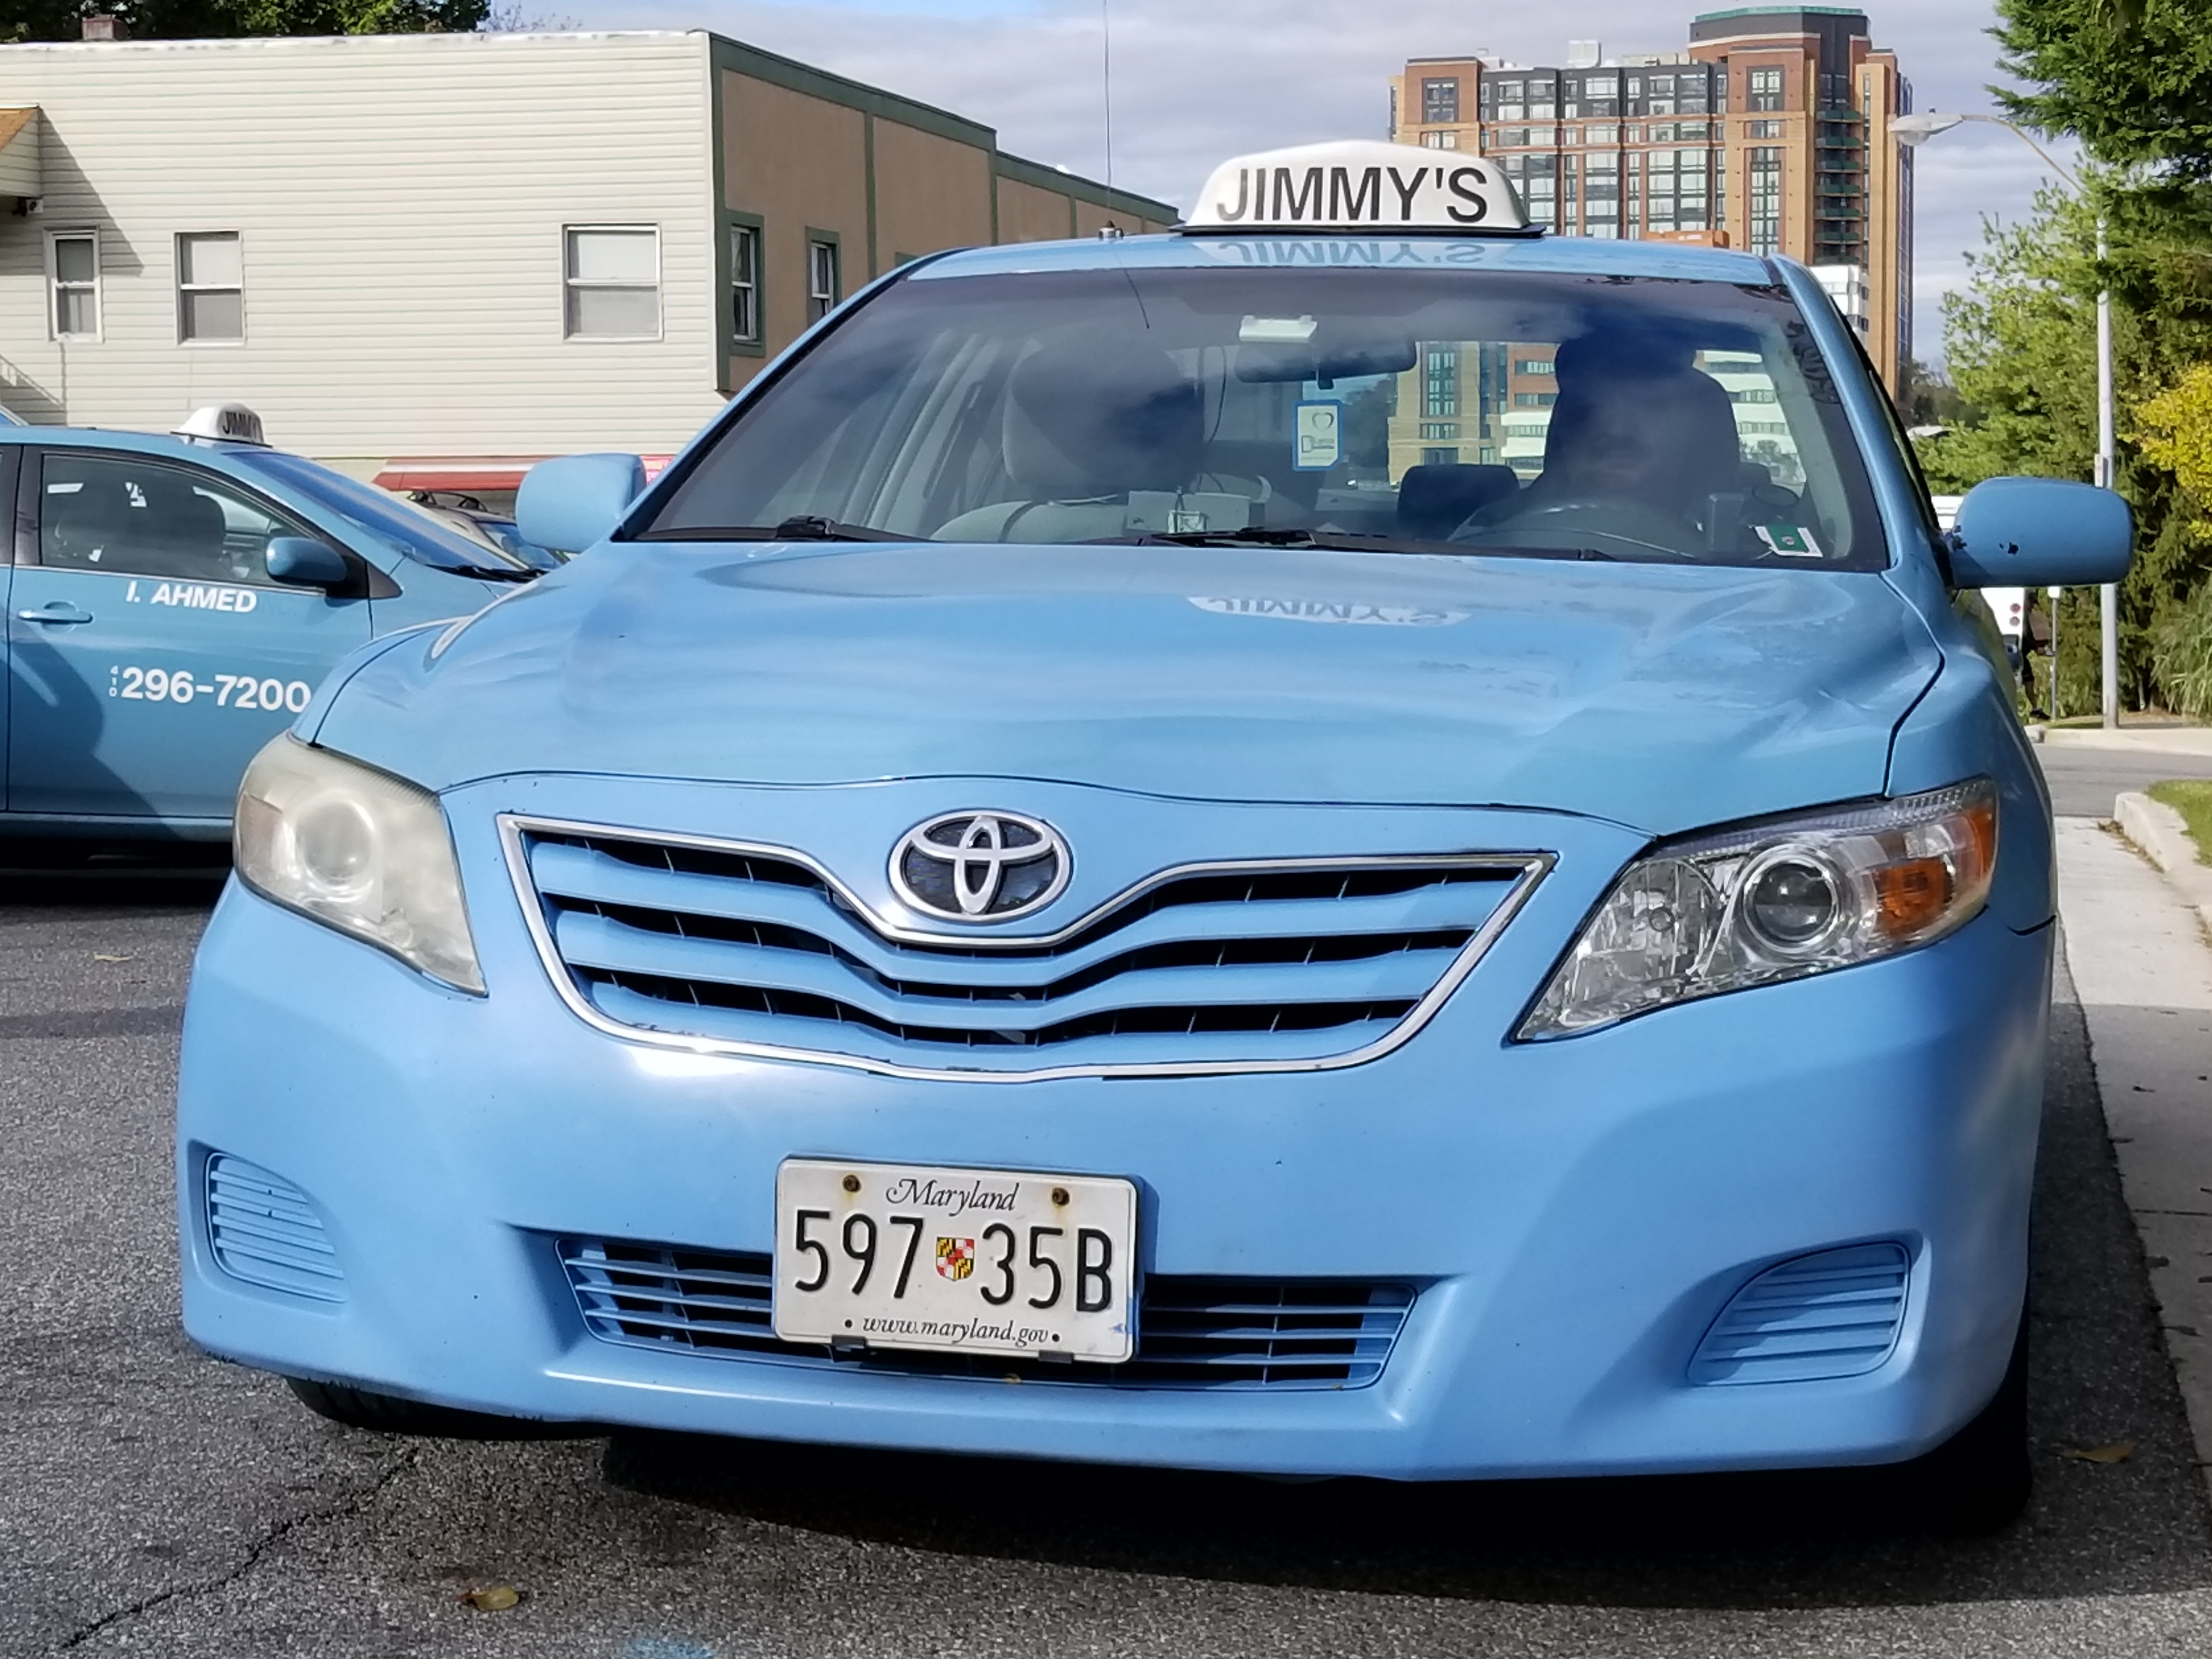 Jimmy's Cab Co image 0